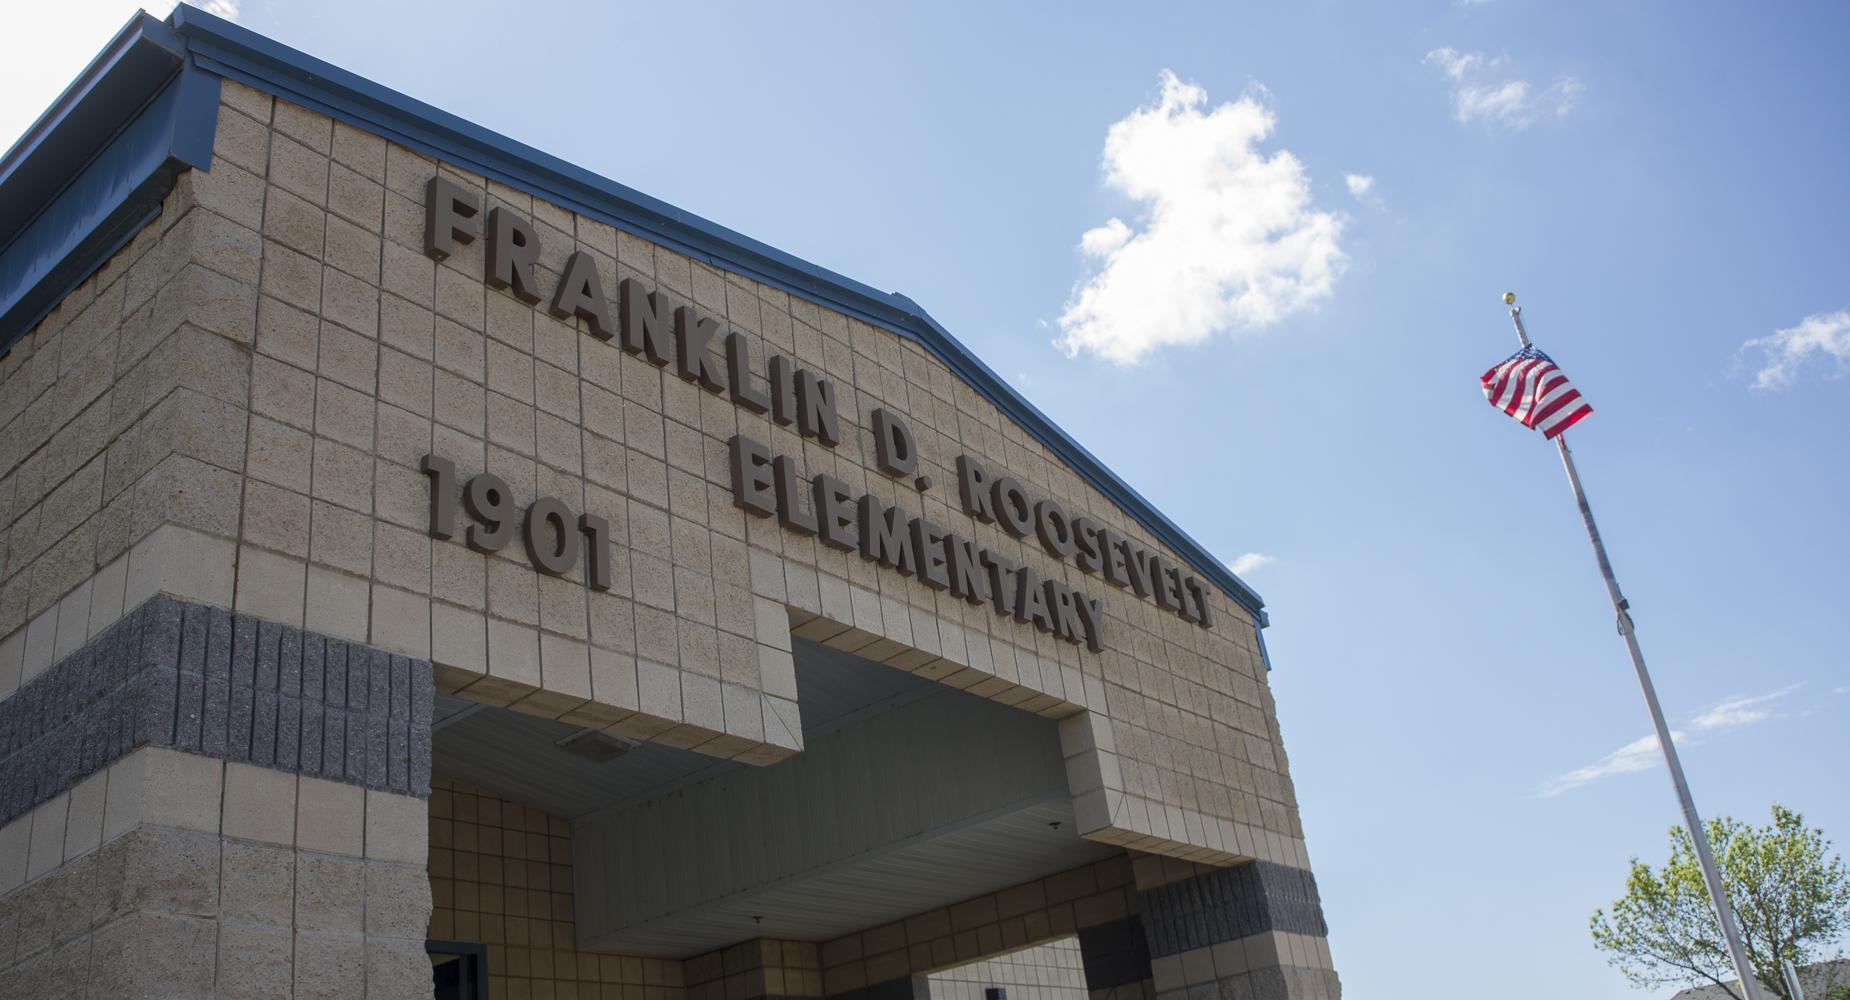 Exterior shot of Roosevelt Elementary